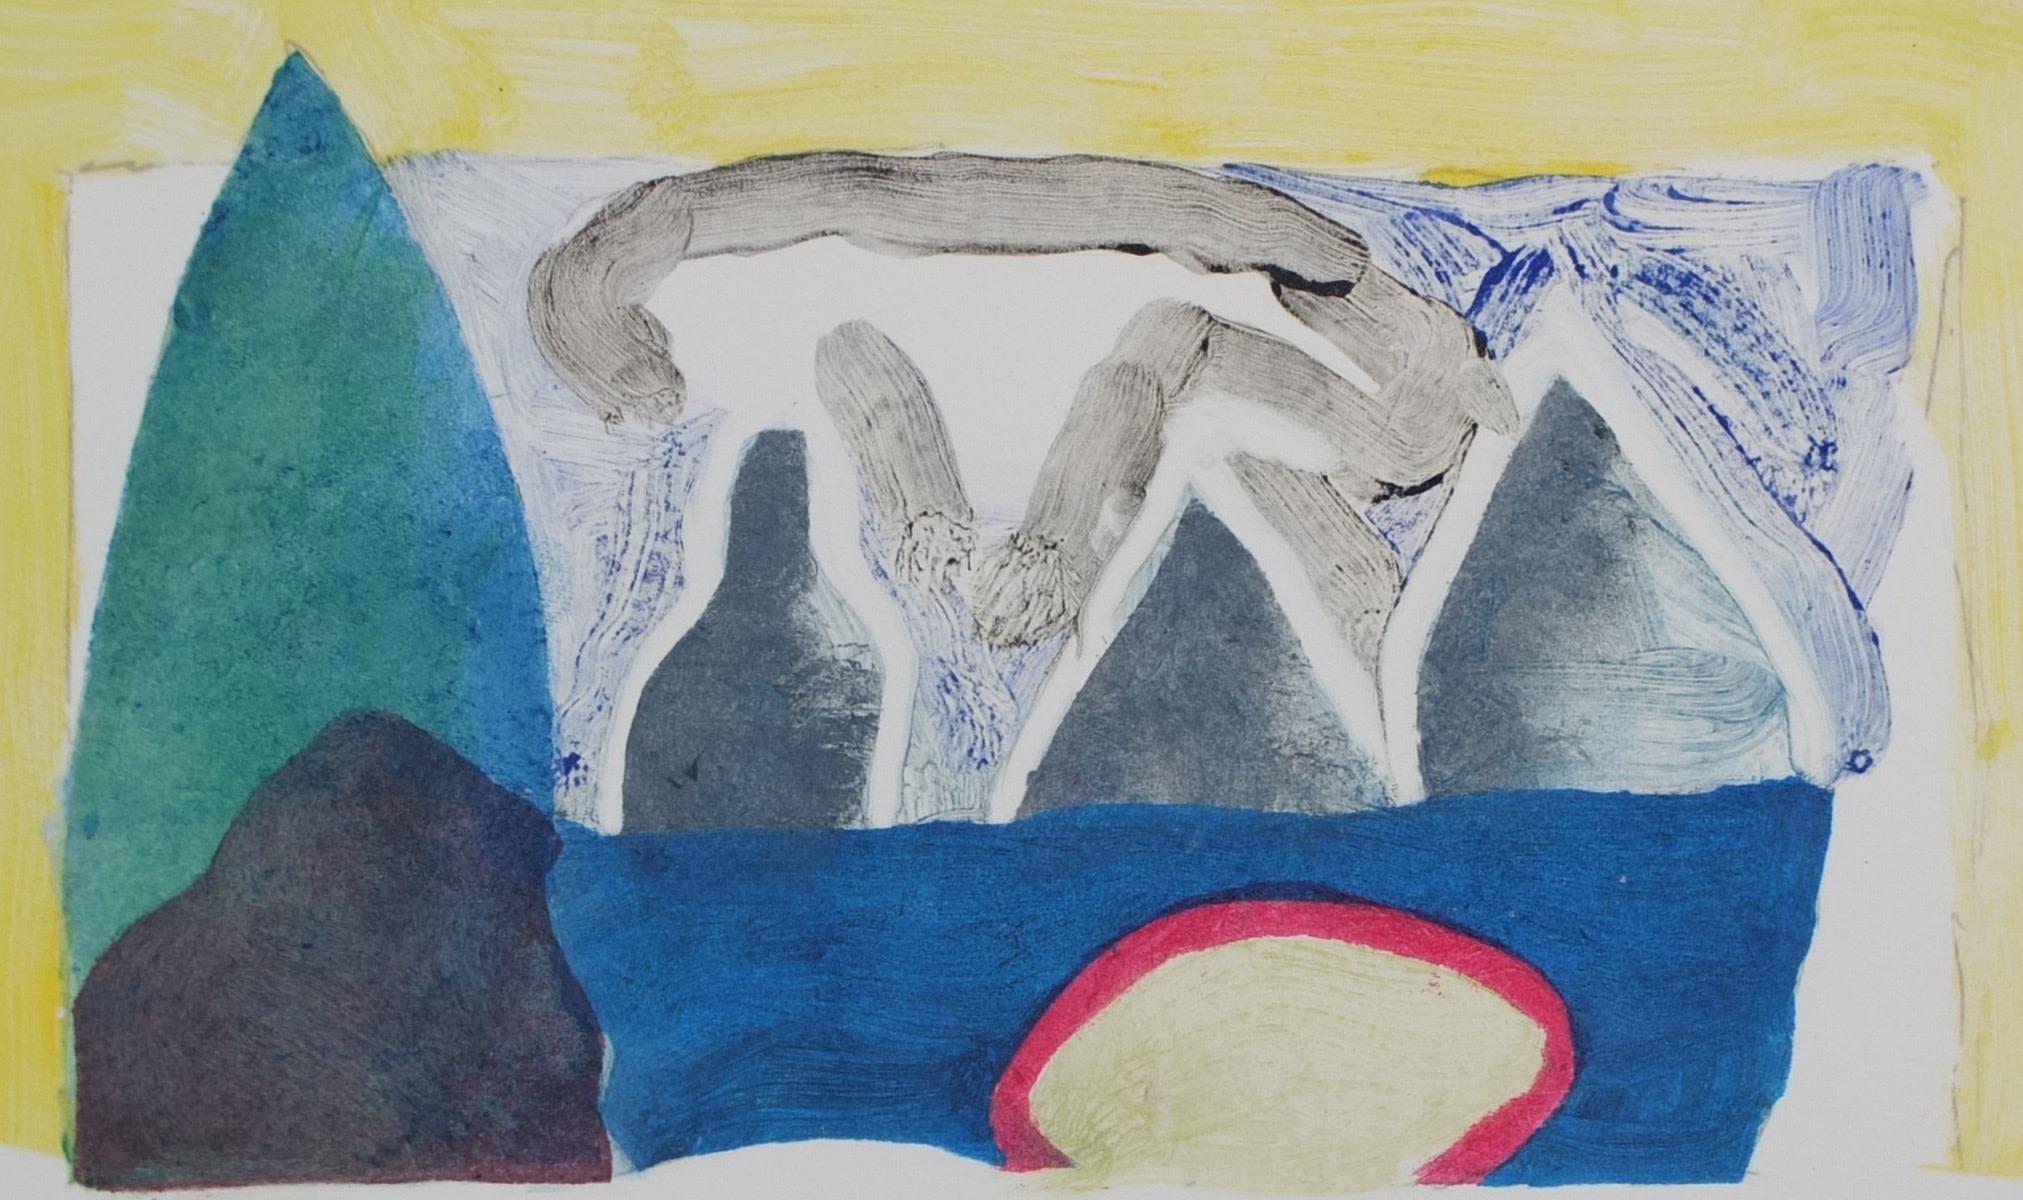 "<span class=""link fancybox-details-link""><a href=""/artists/32-robert-baggaley-re/works/10285/"">View Detail Page</a></span><div class=""artist""><span class=""artist""><strong>Robert Baggaley RE</strong></span></div><div class=""title""><em>Garden No.7</em></div><div class=""medium"">monotype</div><div class=""dimensions"">45 x 38cm framed size</div><div class=""price"">£210.00</div>"